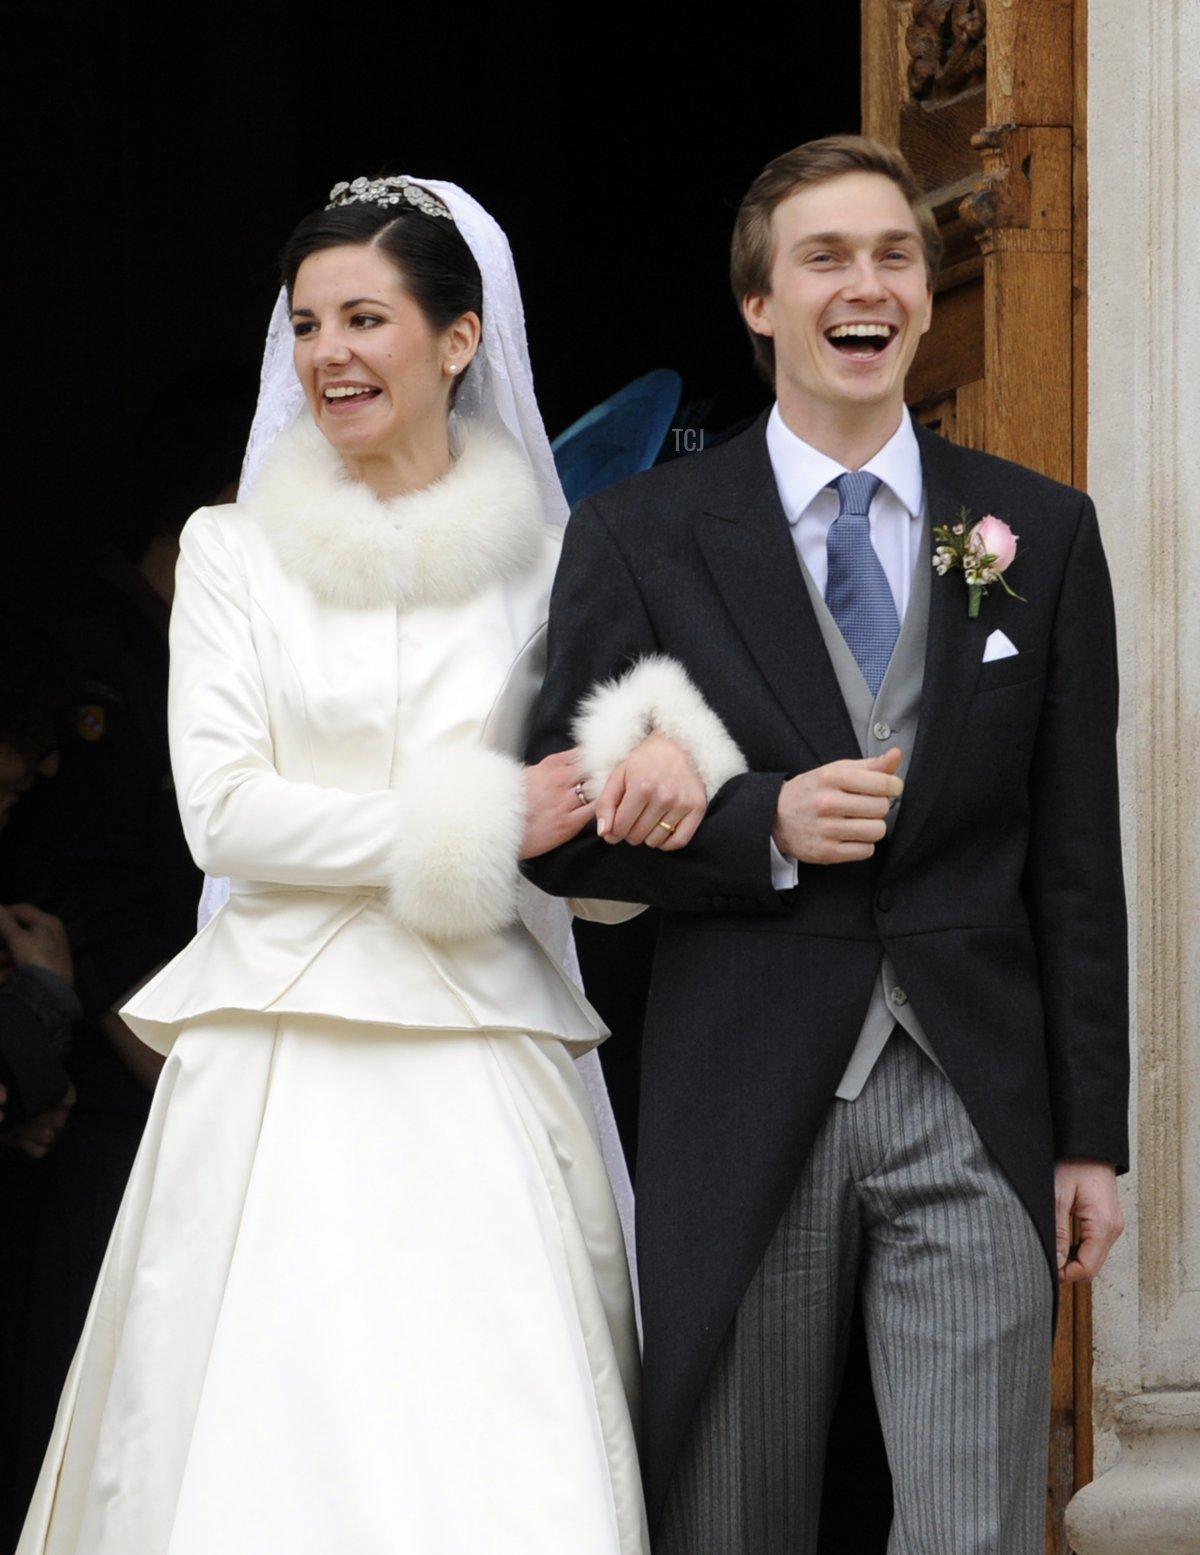 Archduke Christoph of Austria and Adelaide Drape-Frisch on their wedding day, Dec 2012